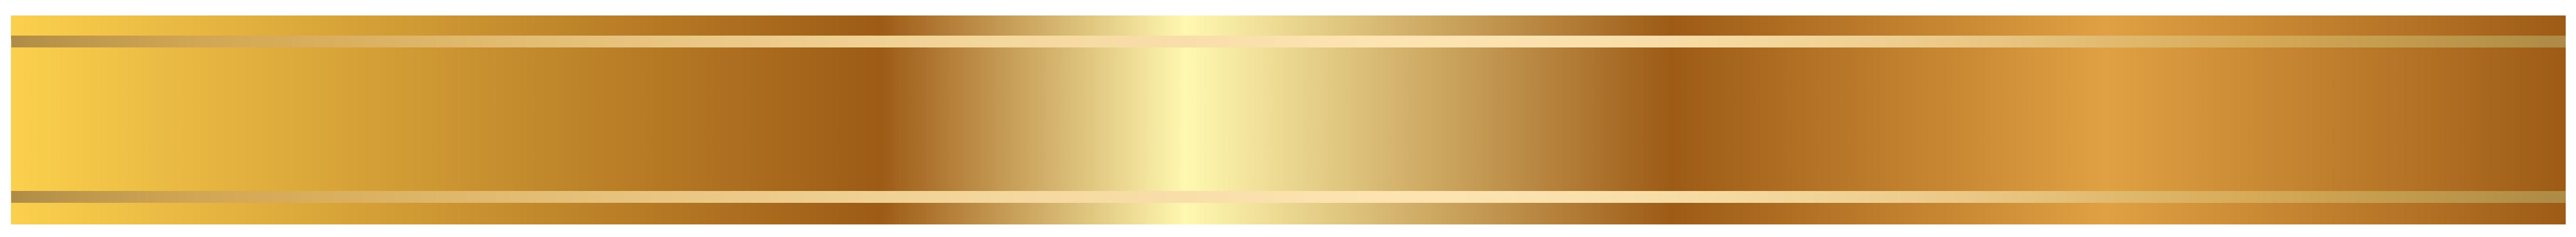 Gold Ribbon Transparent PNG Clip Art Image | Places to ...